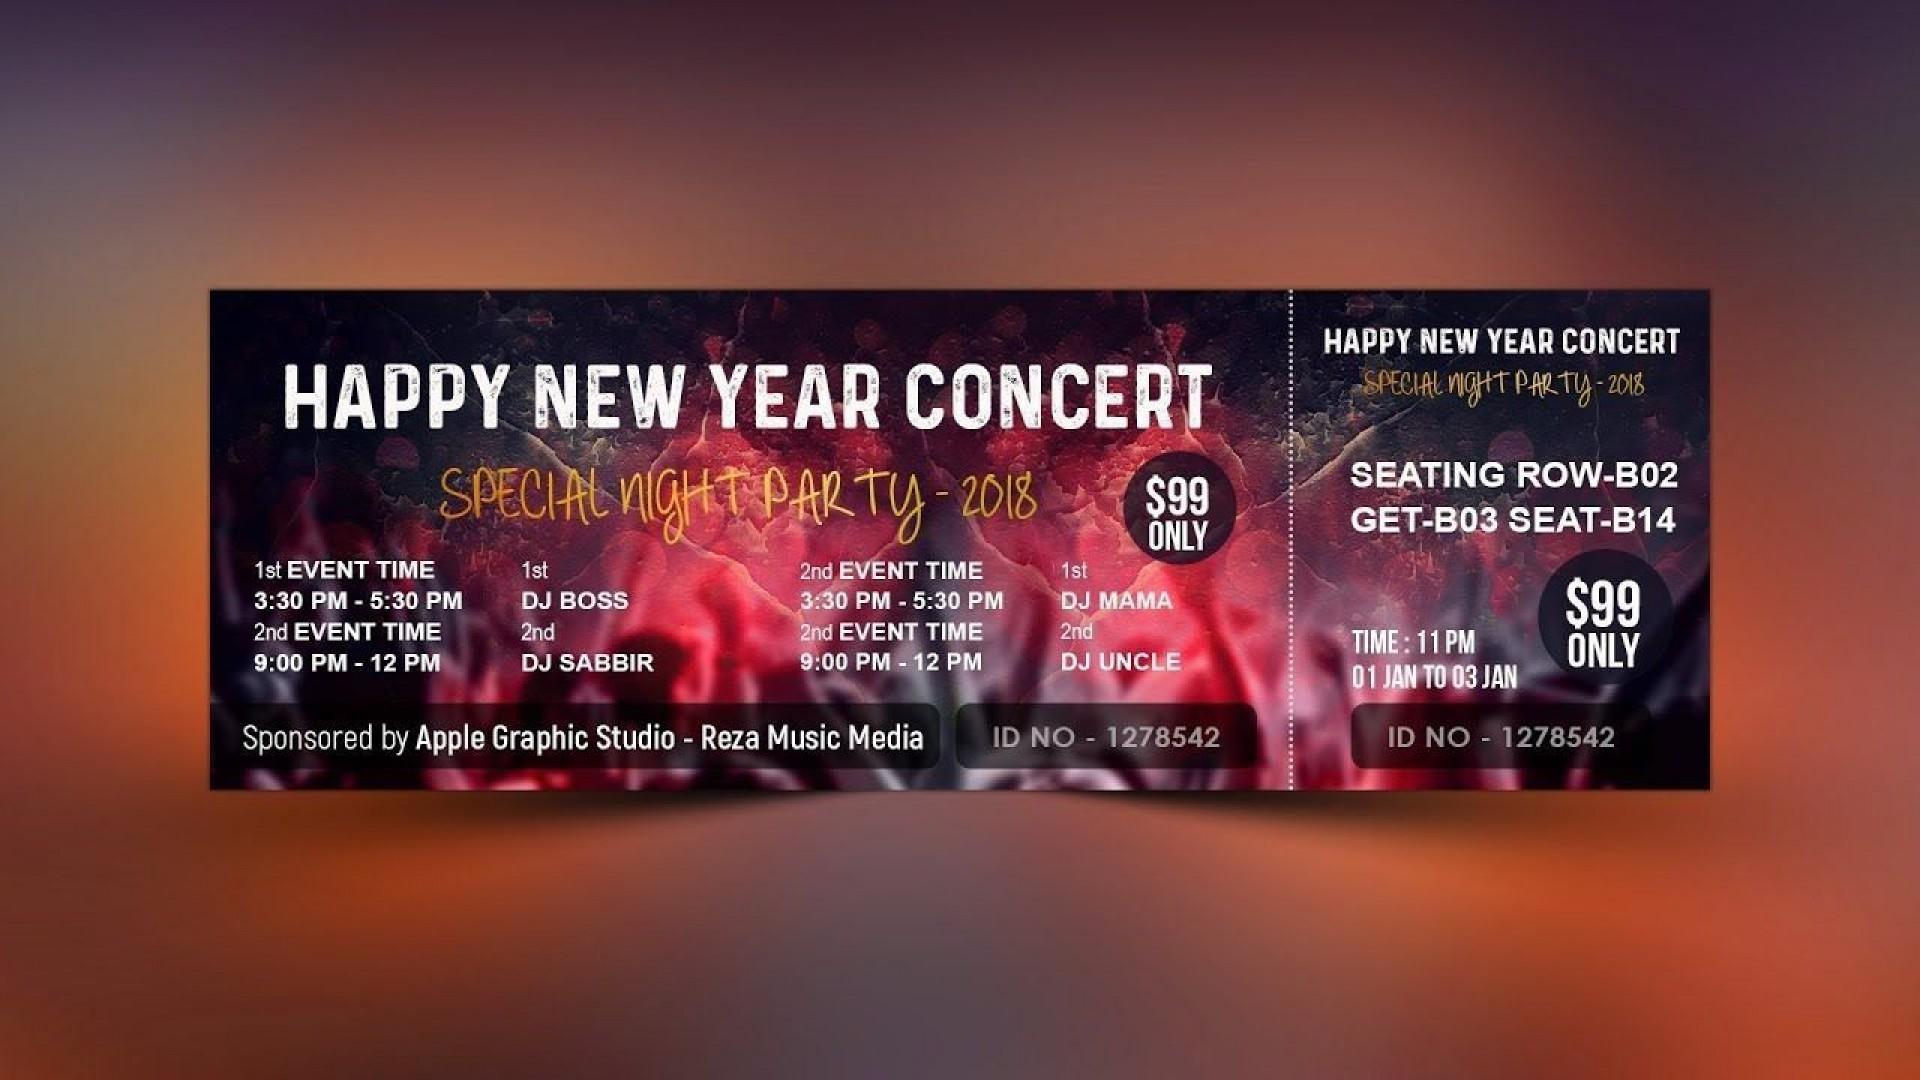 000 Wonderful Event Ticket Template Photoshop Idea  Design Psd Free Download1920